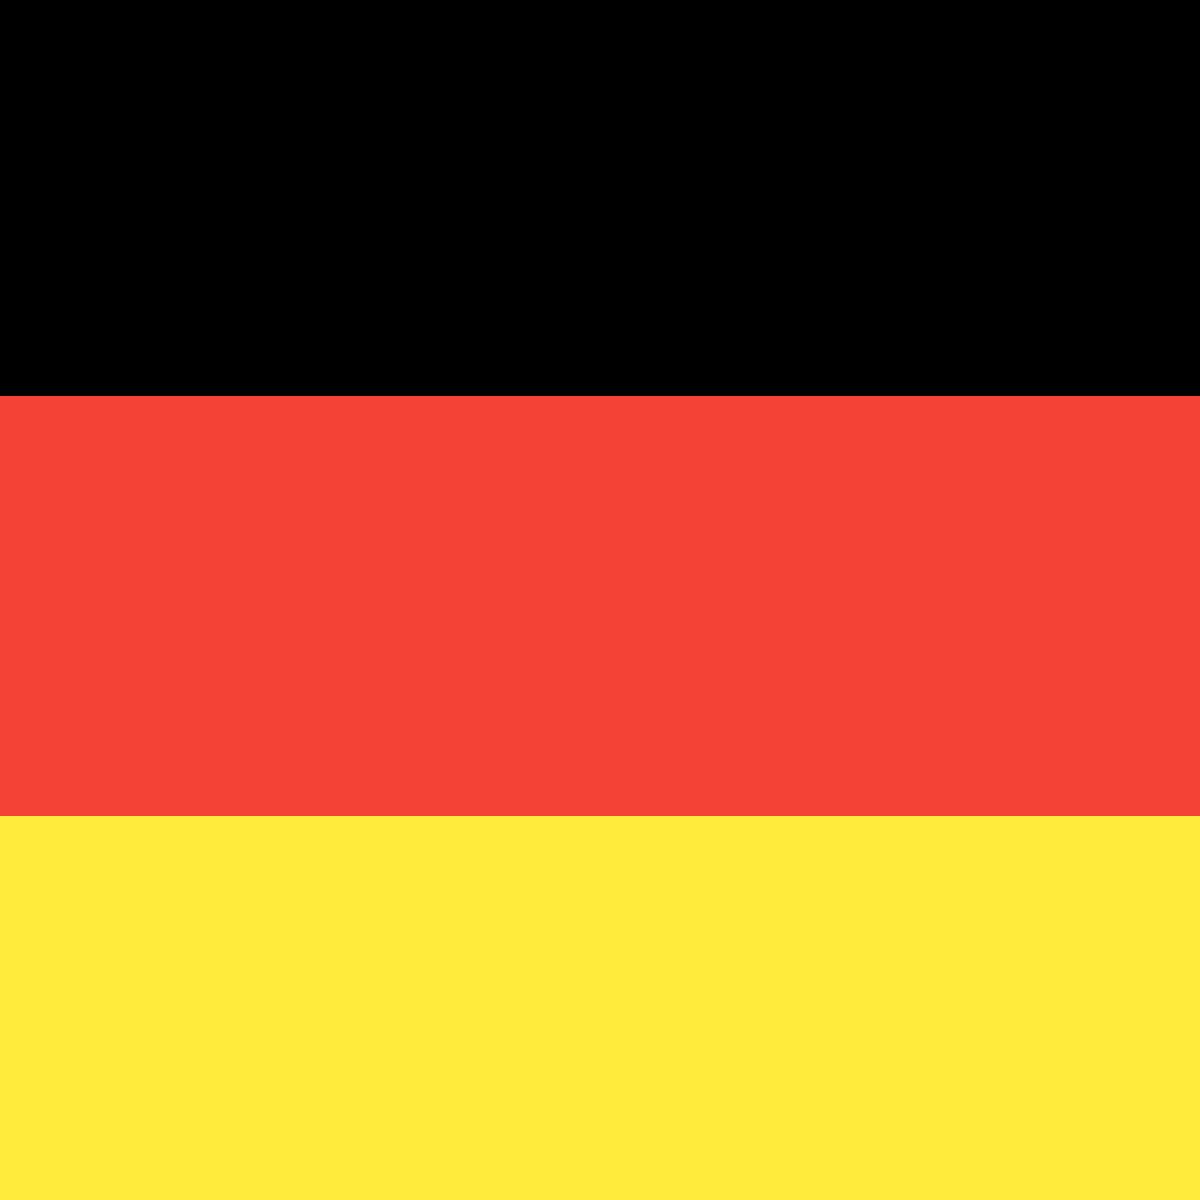 flag by unicornpanda